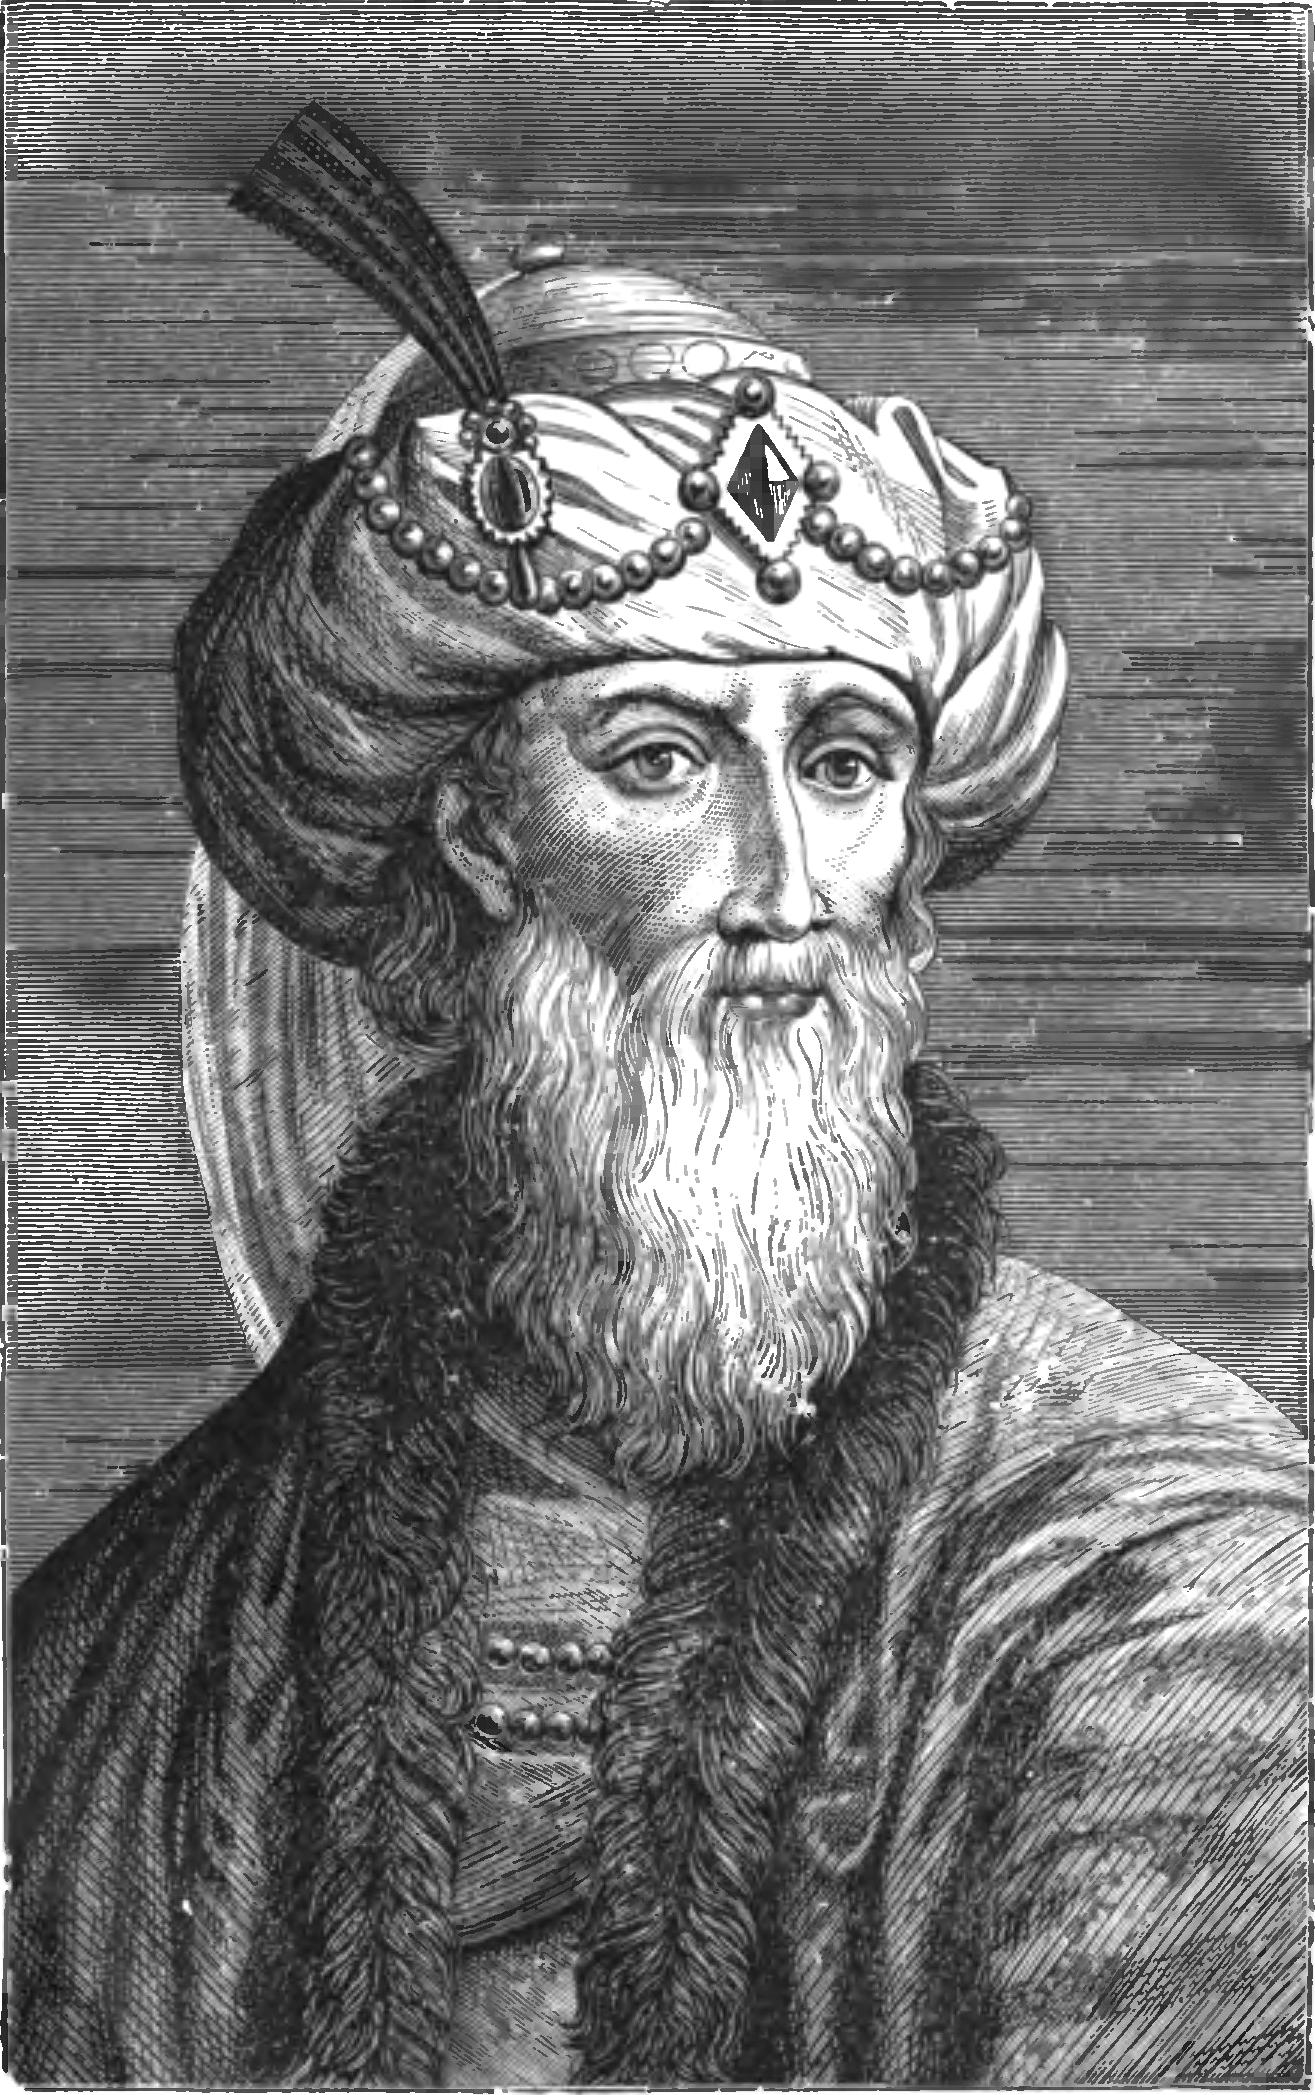 Author Flavius JosephusTranslator William Whiston / Public domain